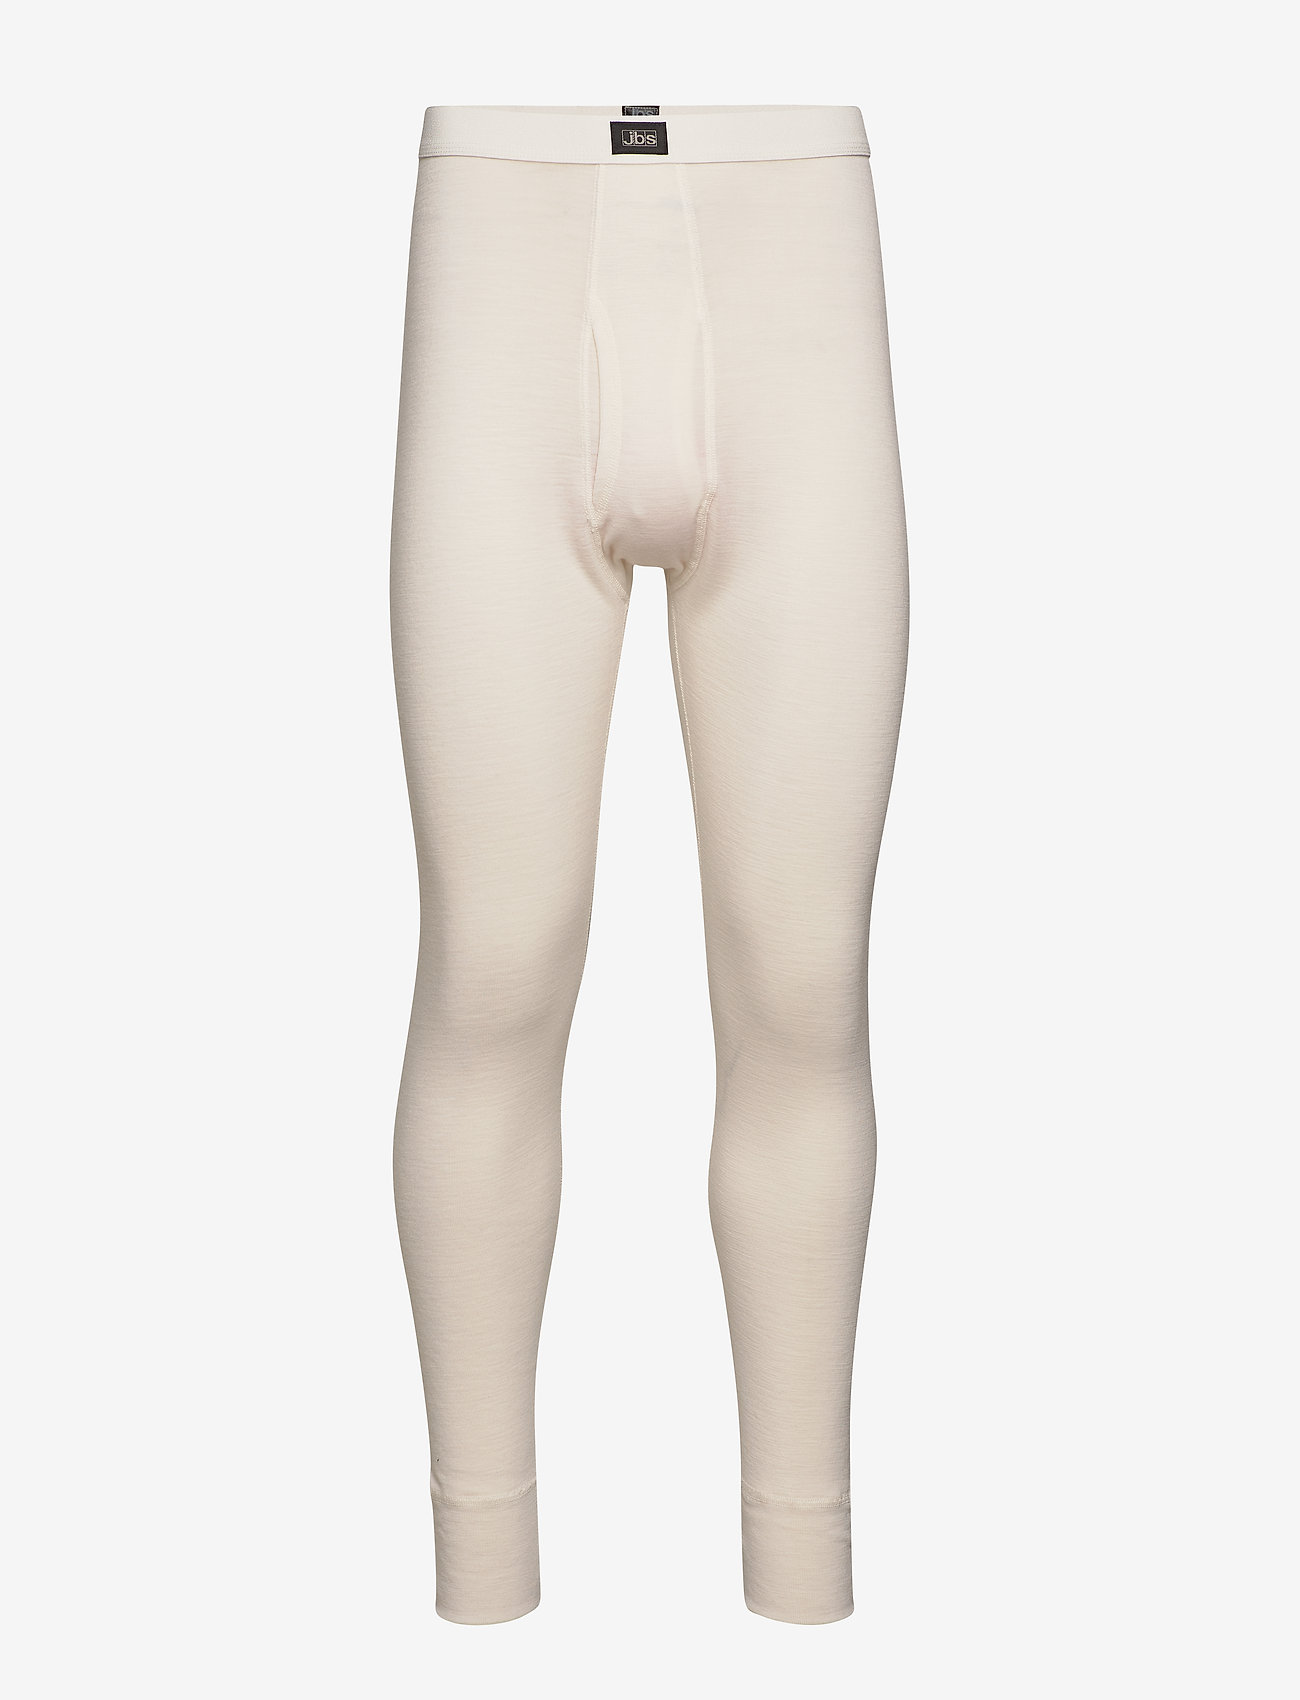 JBS - JBS, long johns - lange unterhosen - white - 0